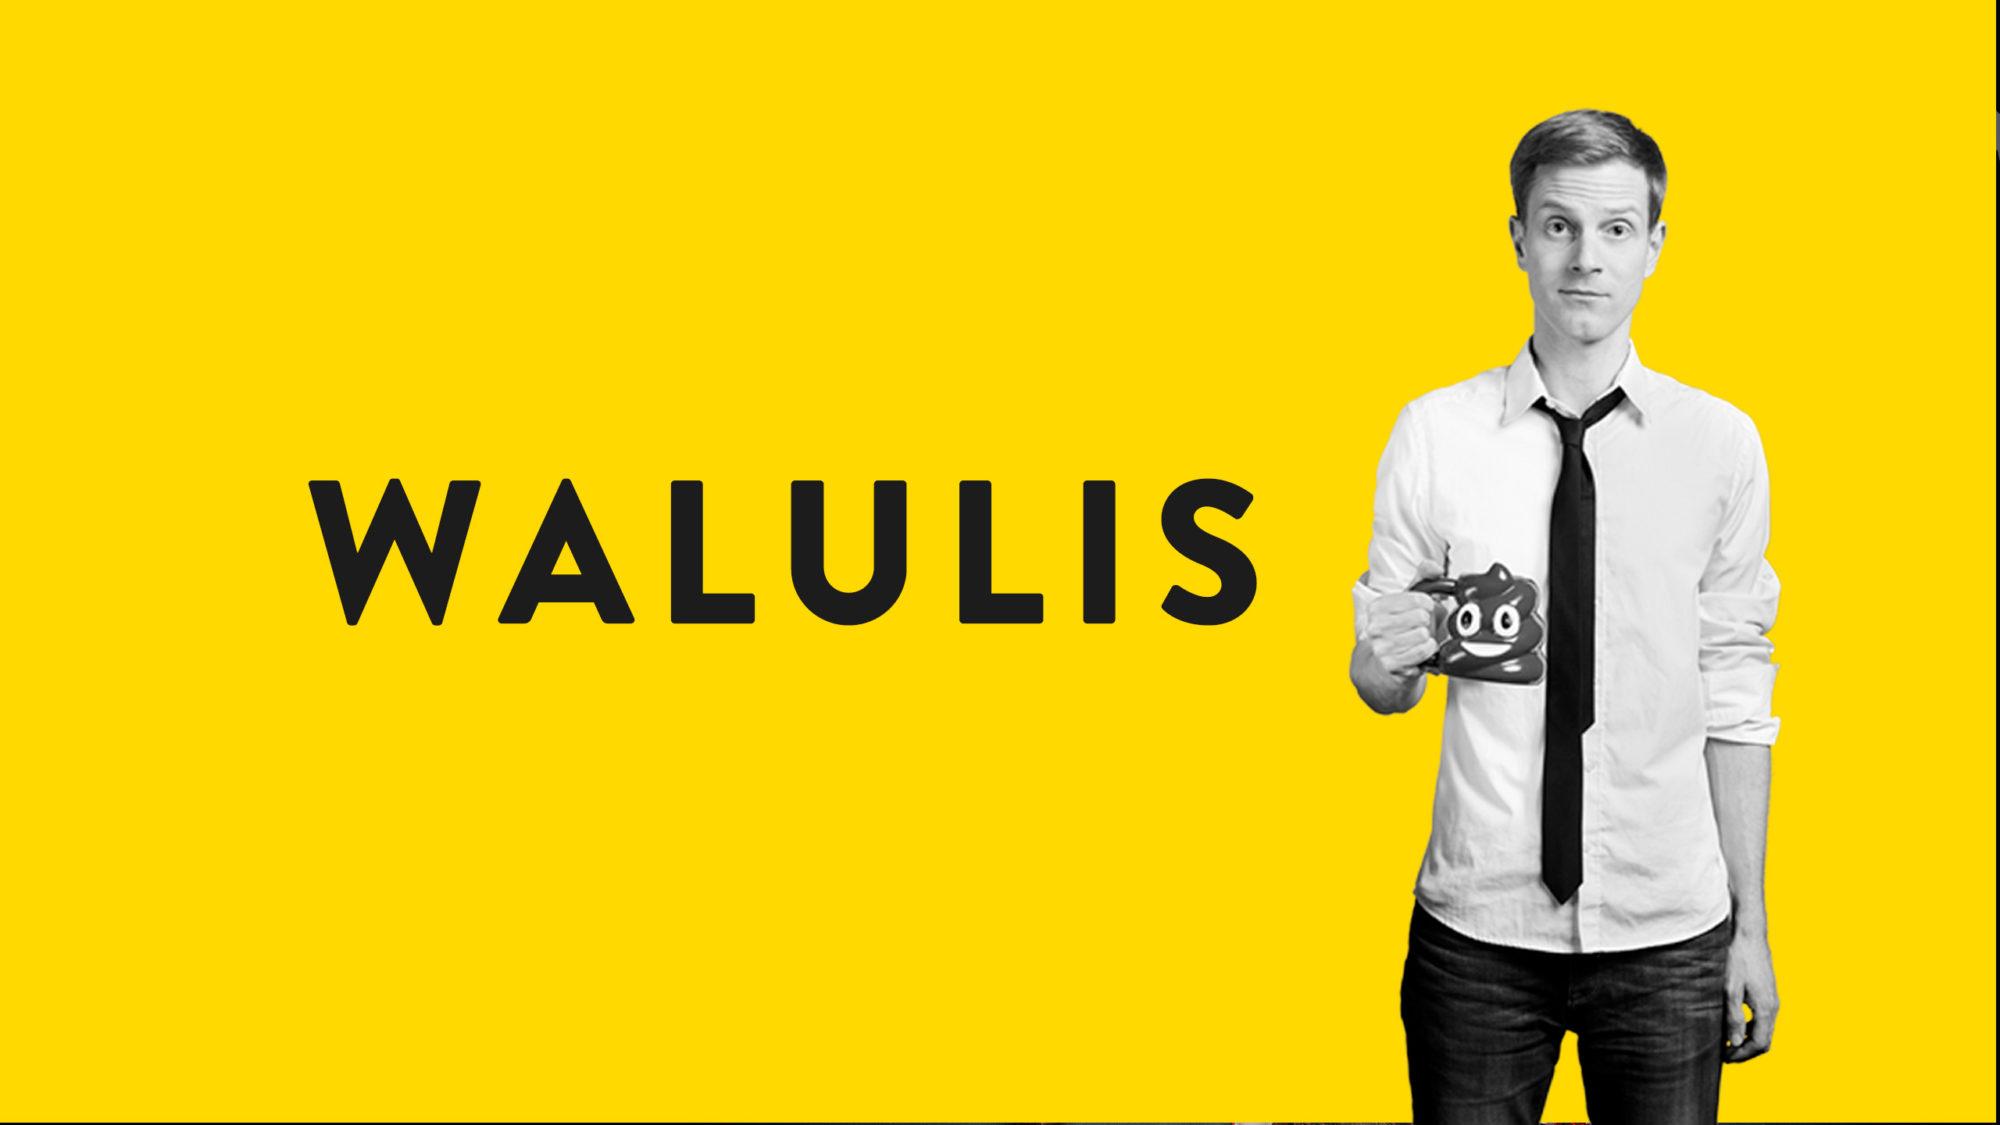 Waluis